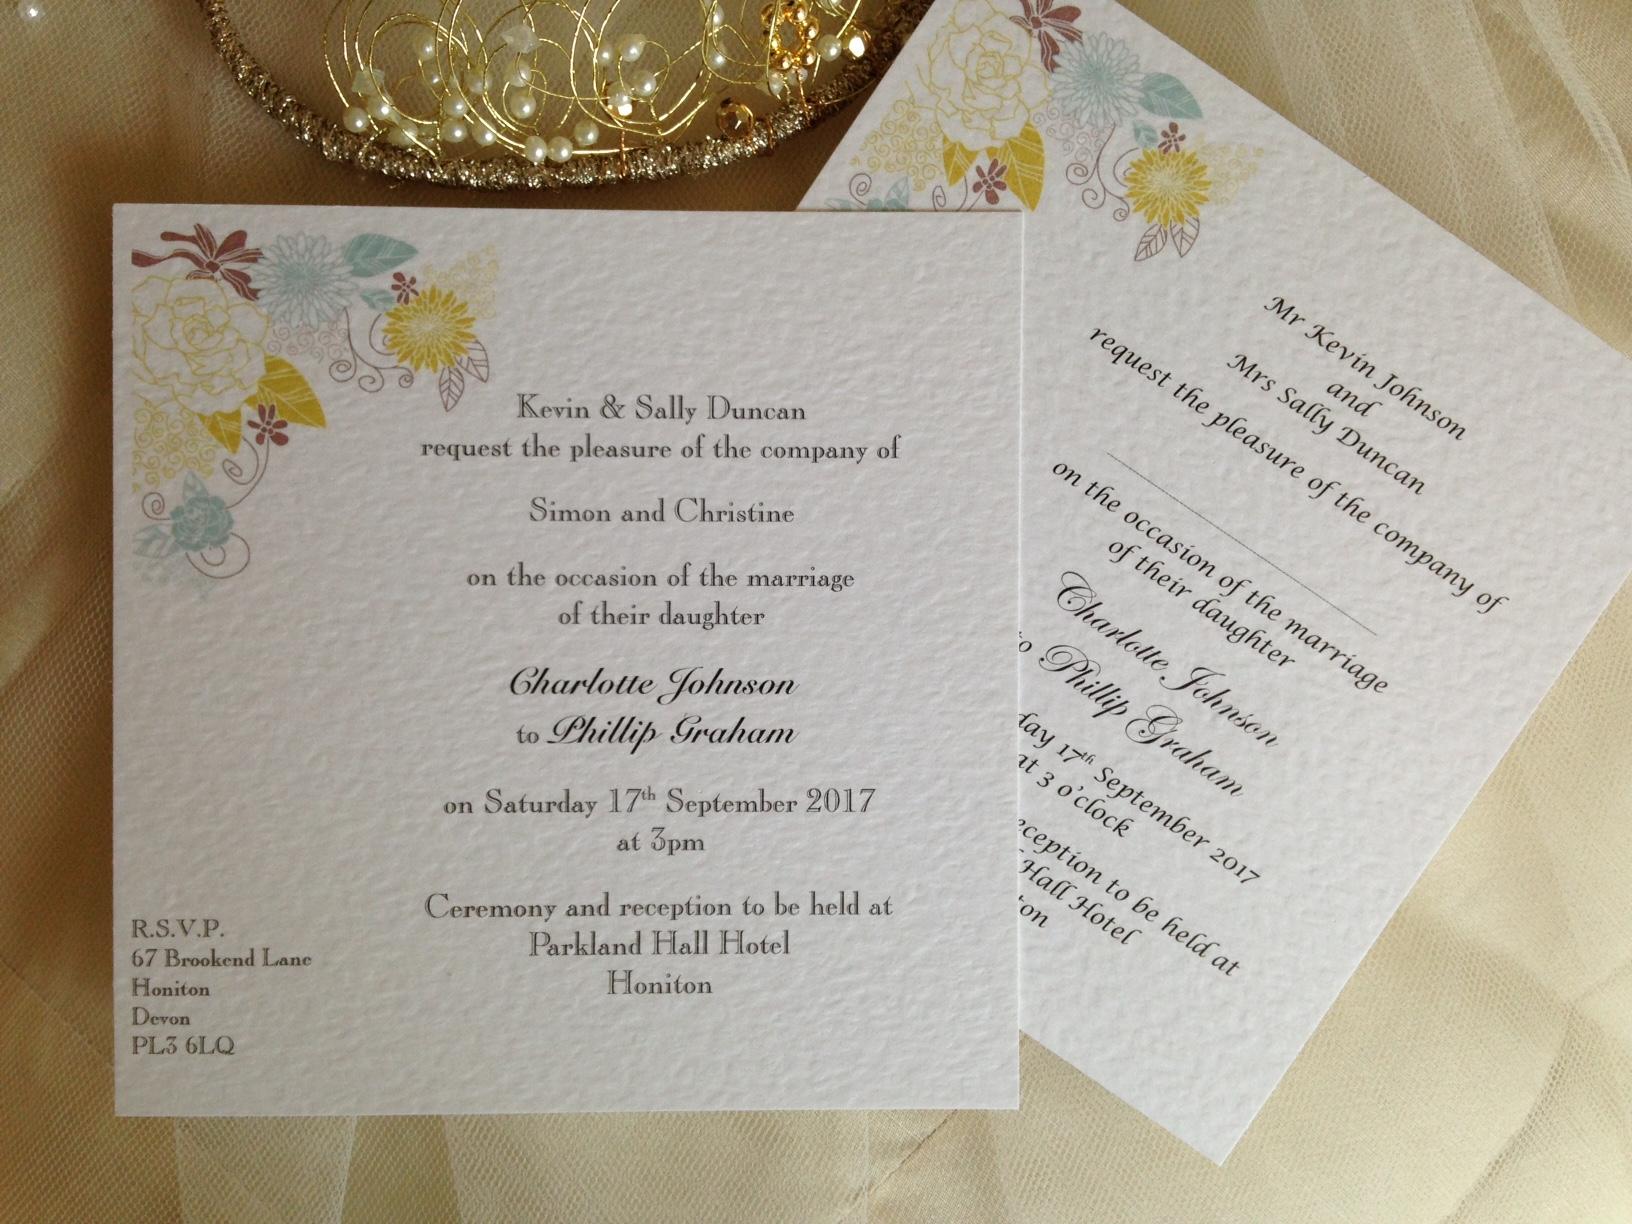 Bargain Wedding Invitations: Blooms Flat Square Wedding Invitations Under £1